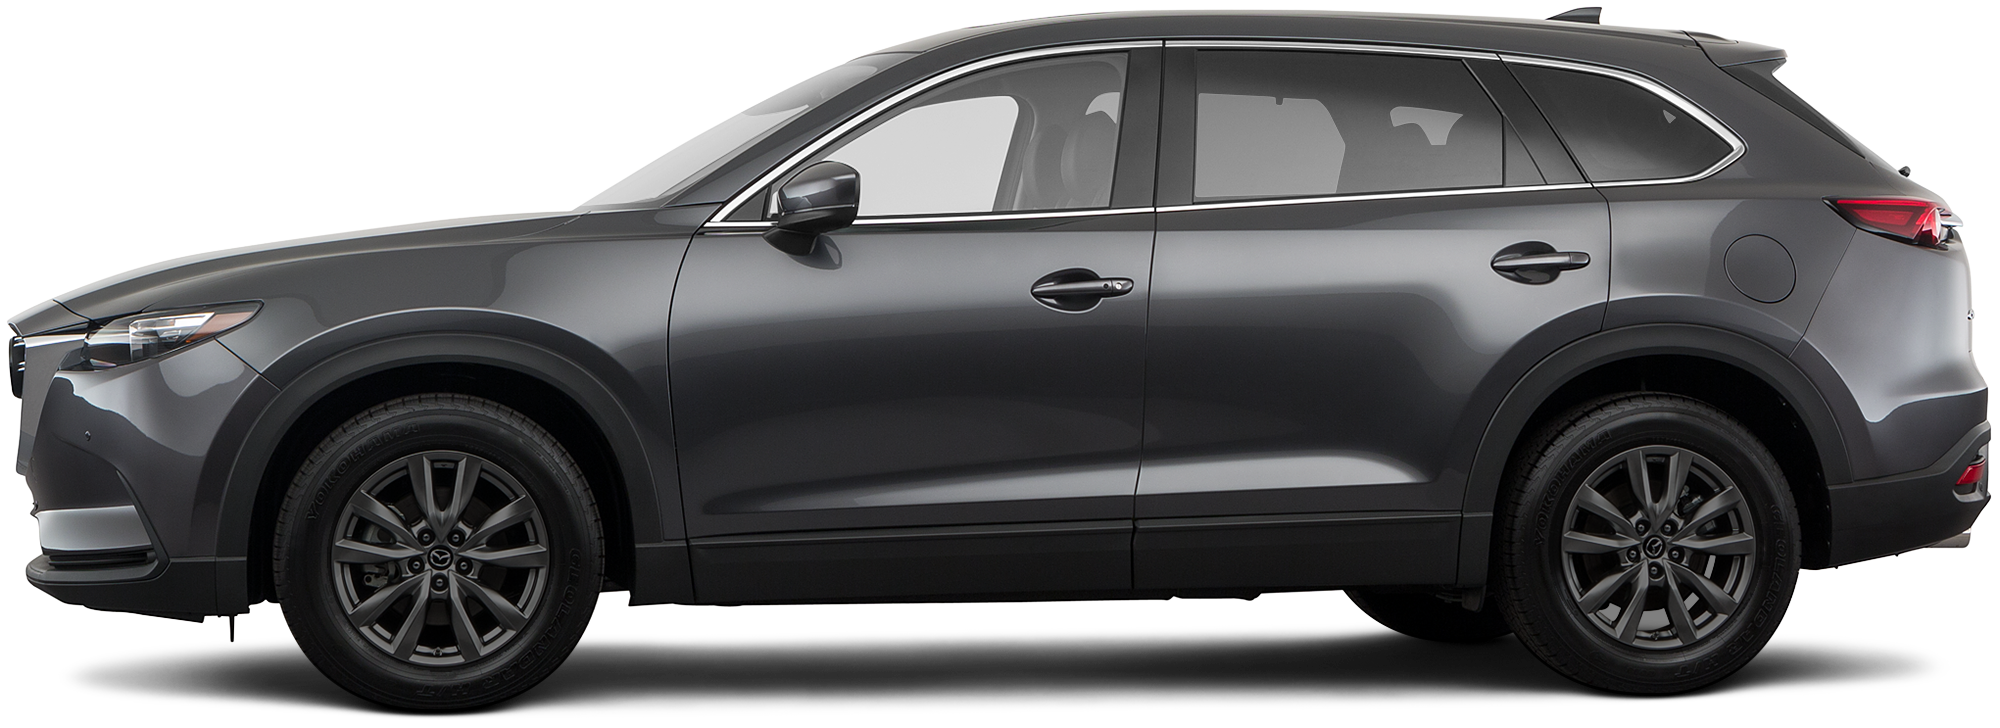 2020 Mazda Mazda CX-9 SUV Sport